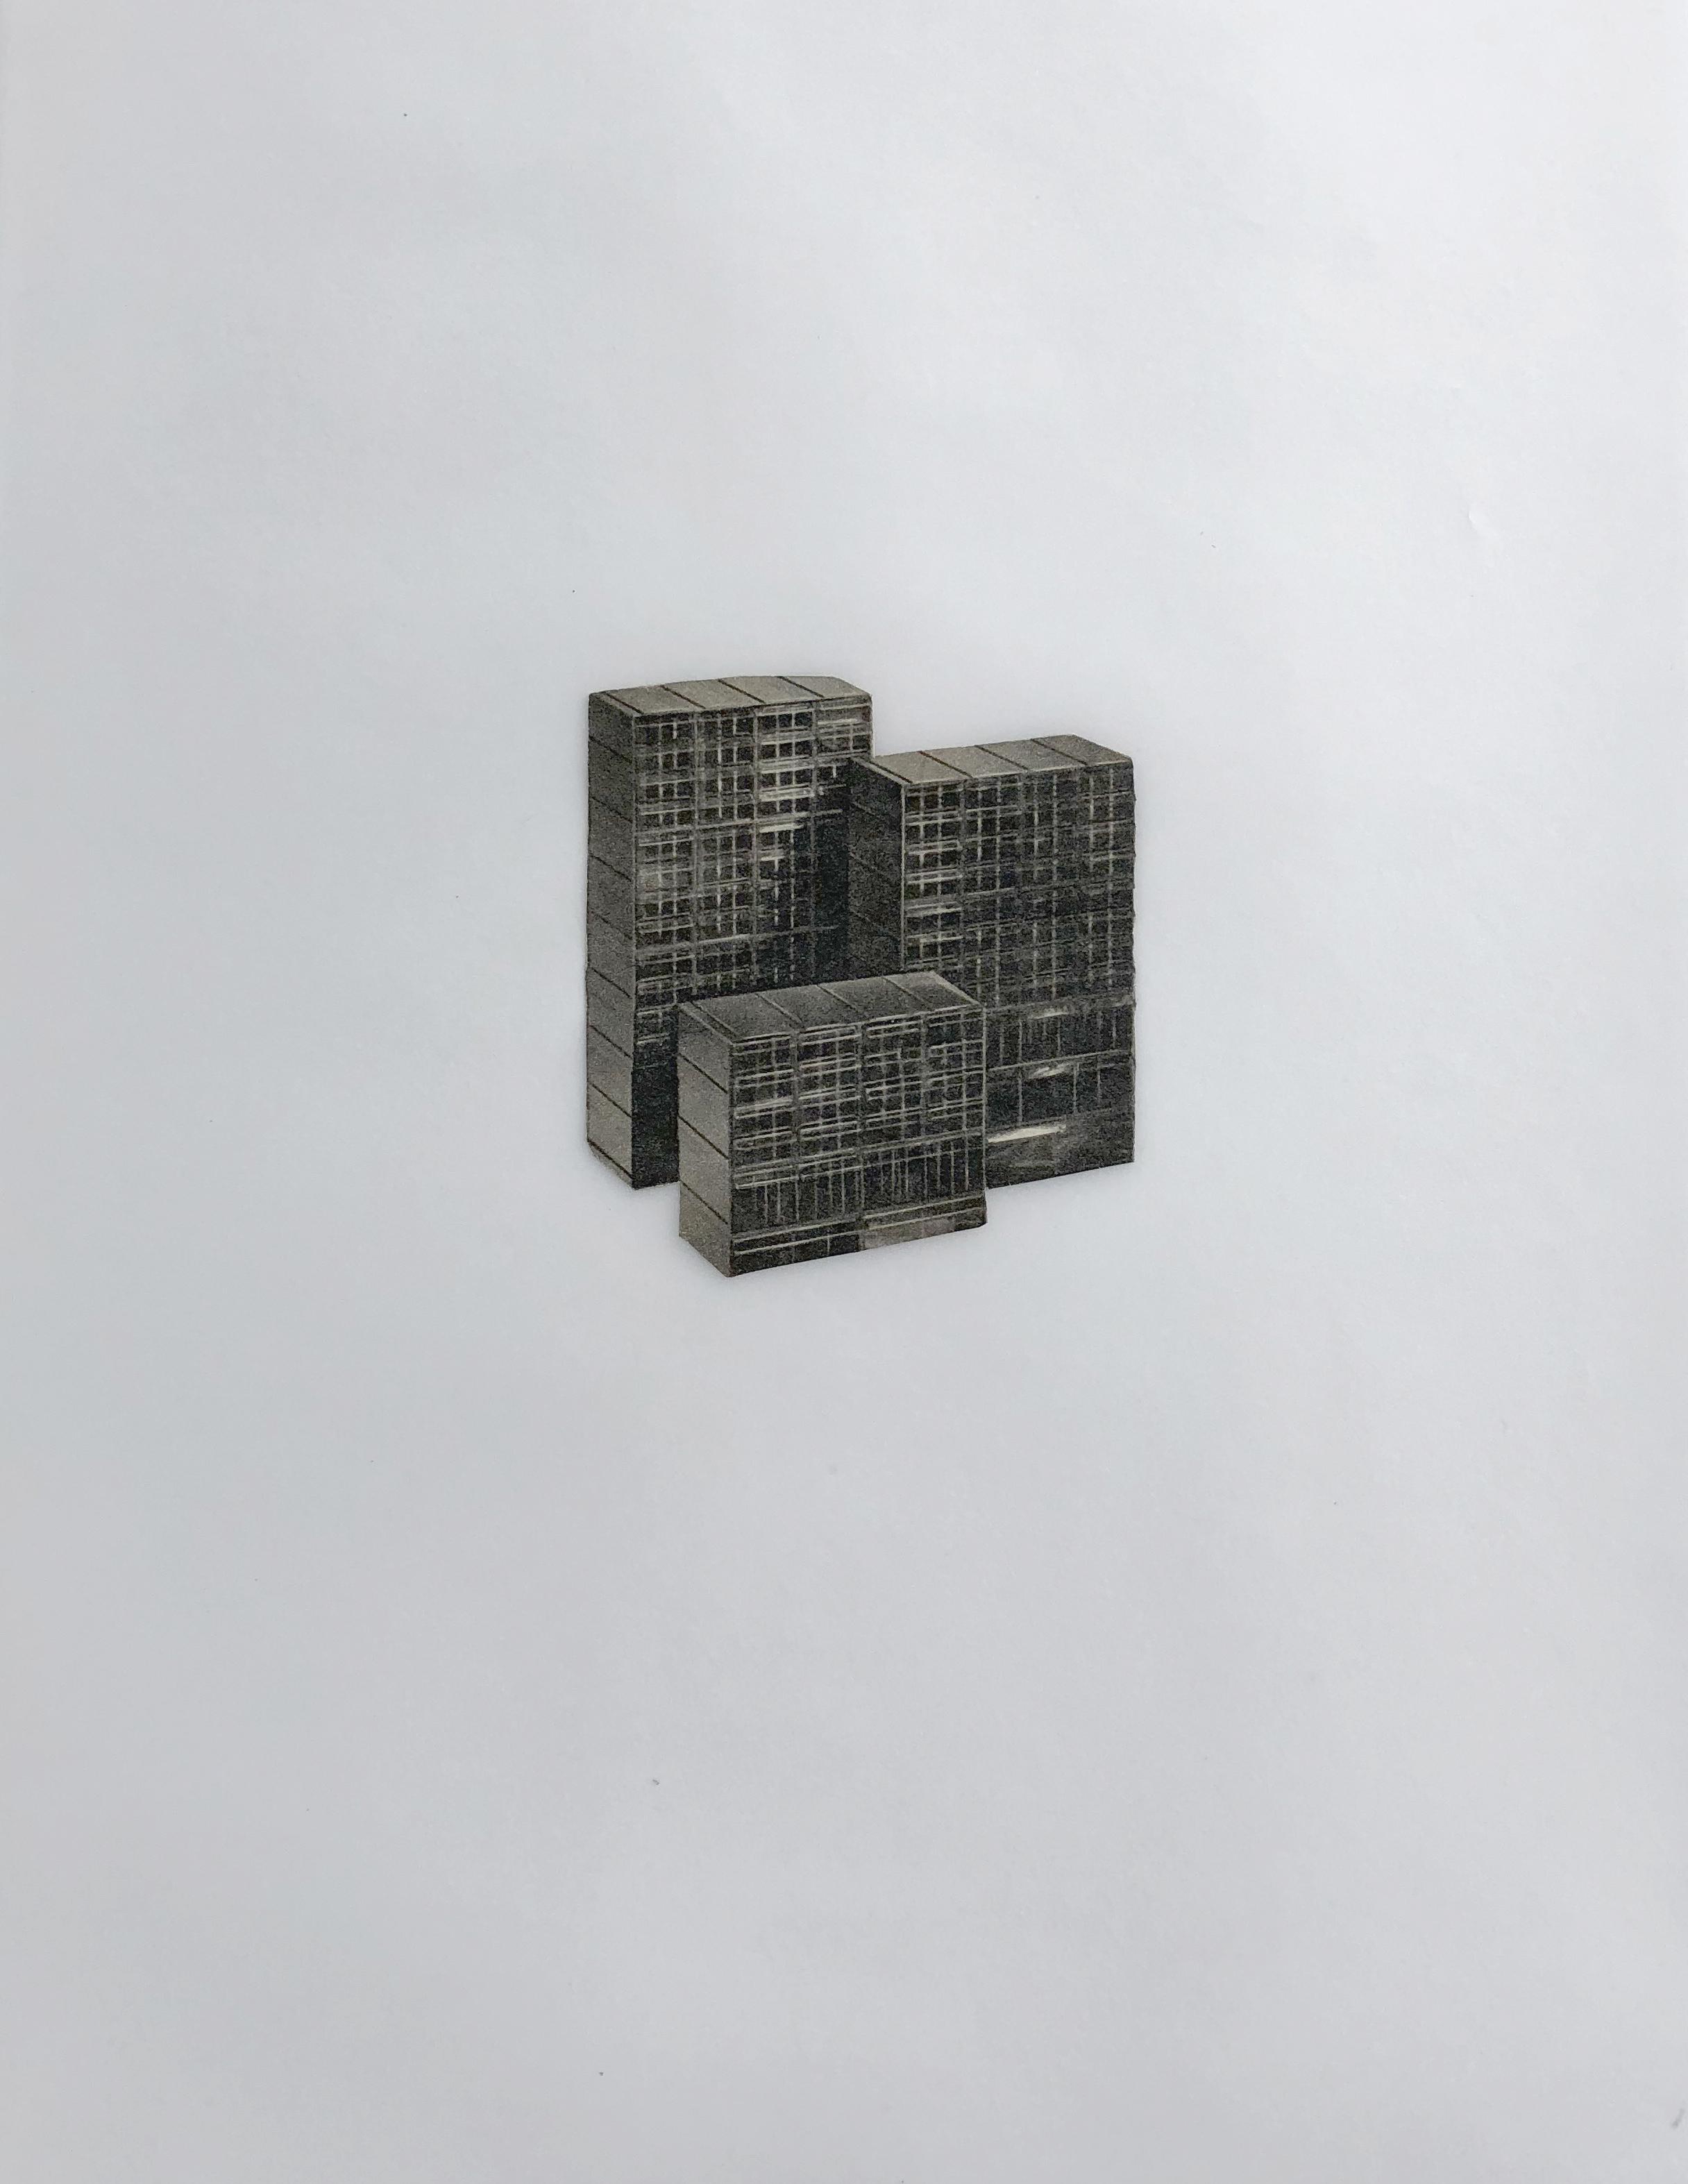 CAT - ARCH - Mies Seagram - CROP.jpg